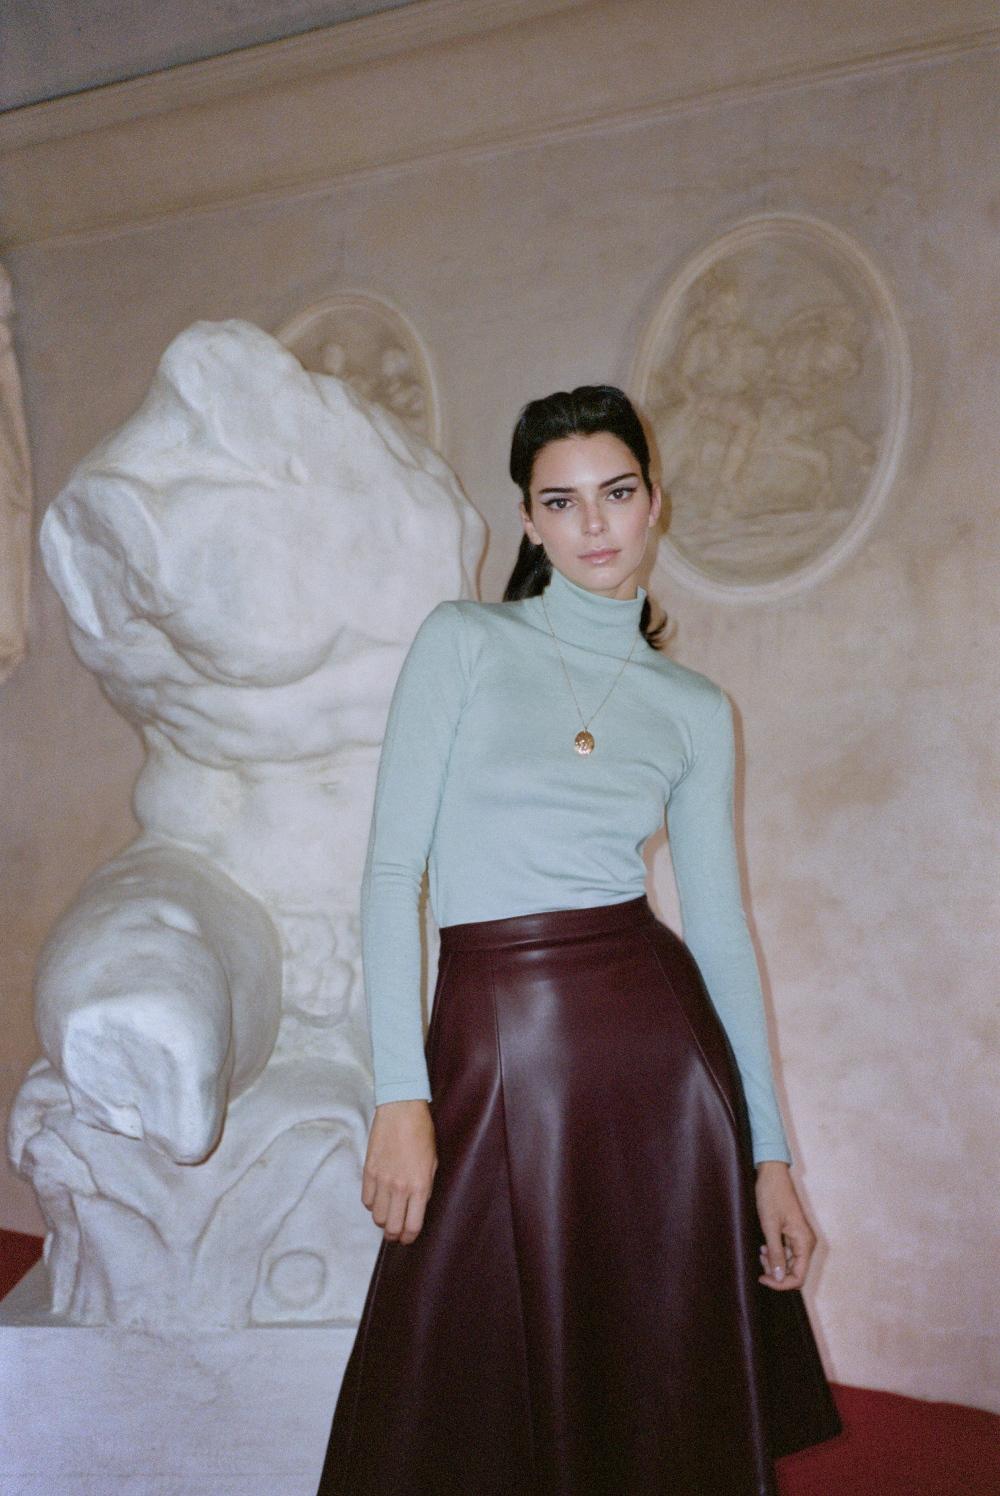 kendall jenner x reserved 2 Kendall Jenner: Modni fenomen i devojka koja je pokrenula social media revoluciju